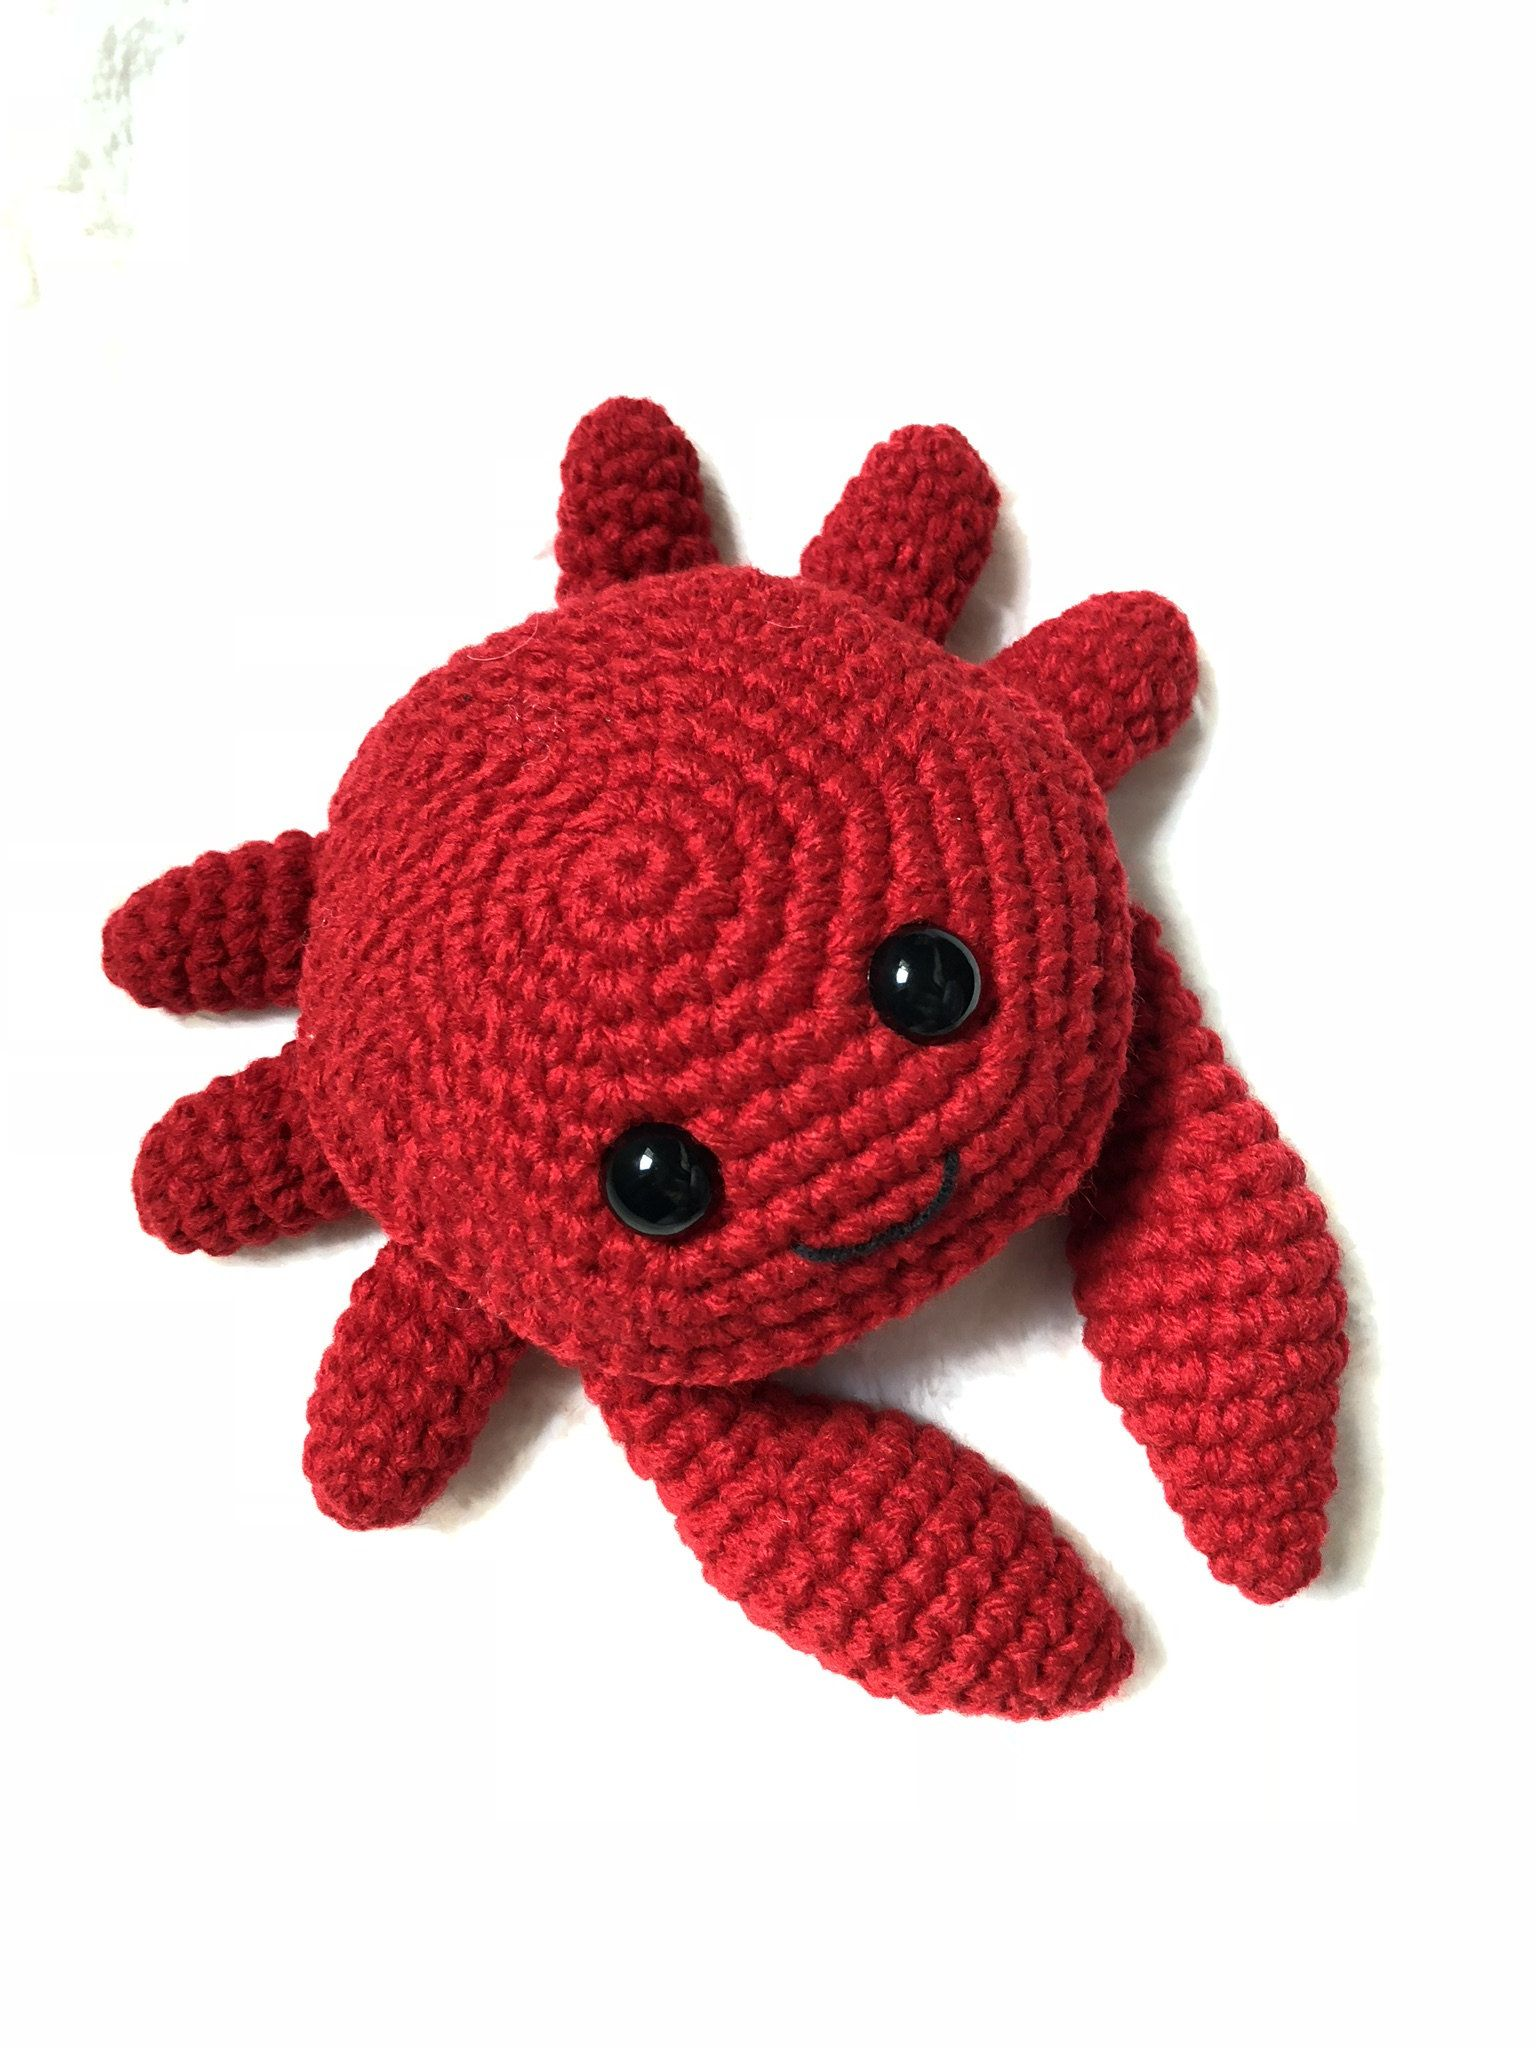 Crochet crab pattern, Patron para tejer un cangrejo, Crab digital ...